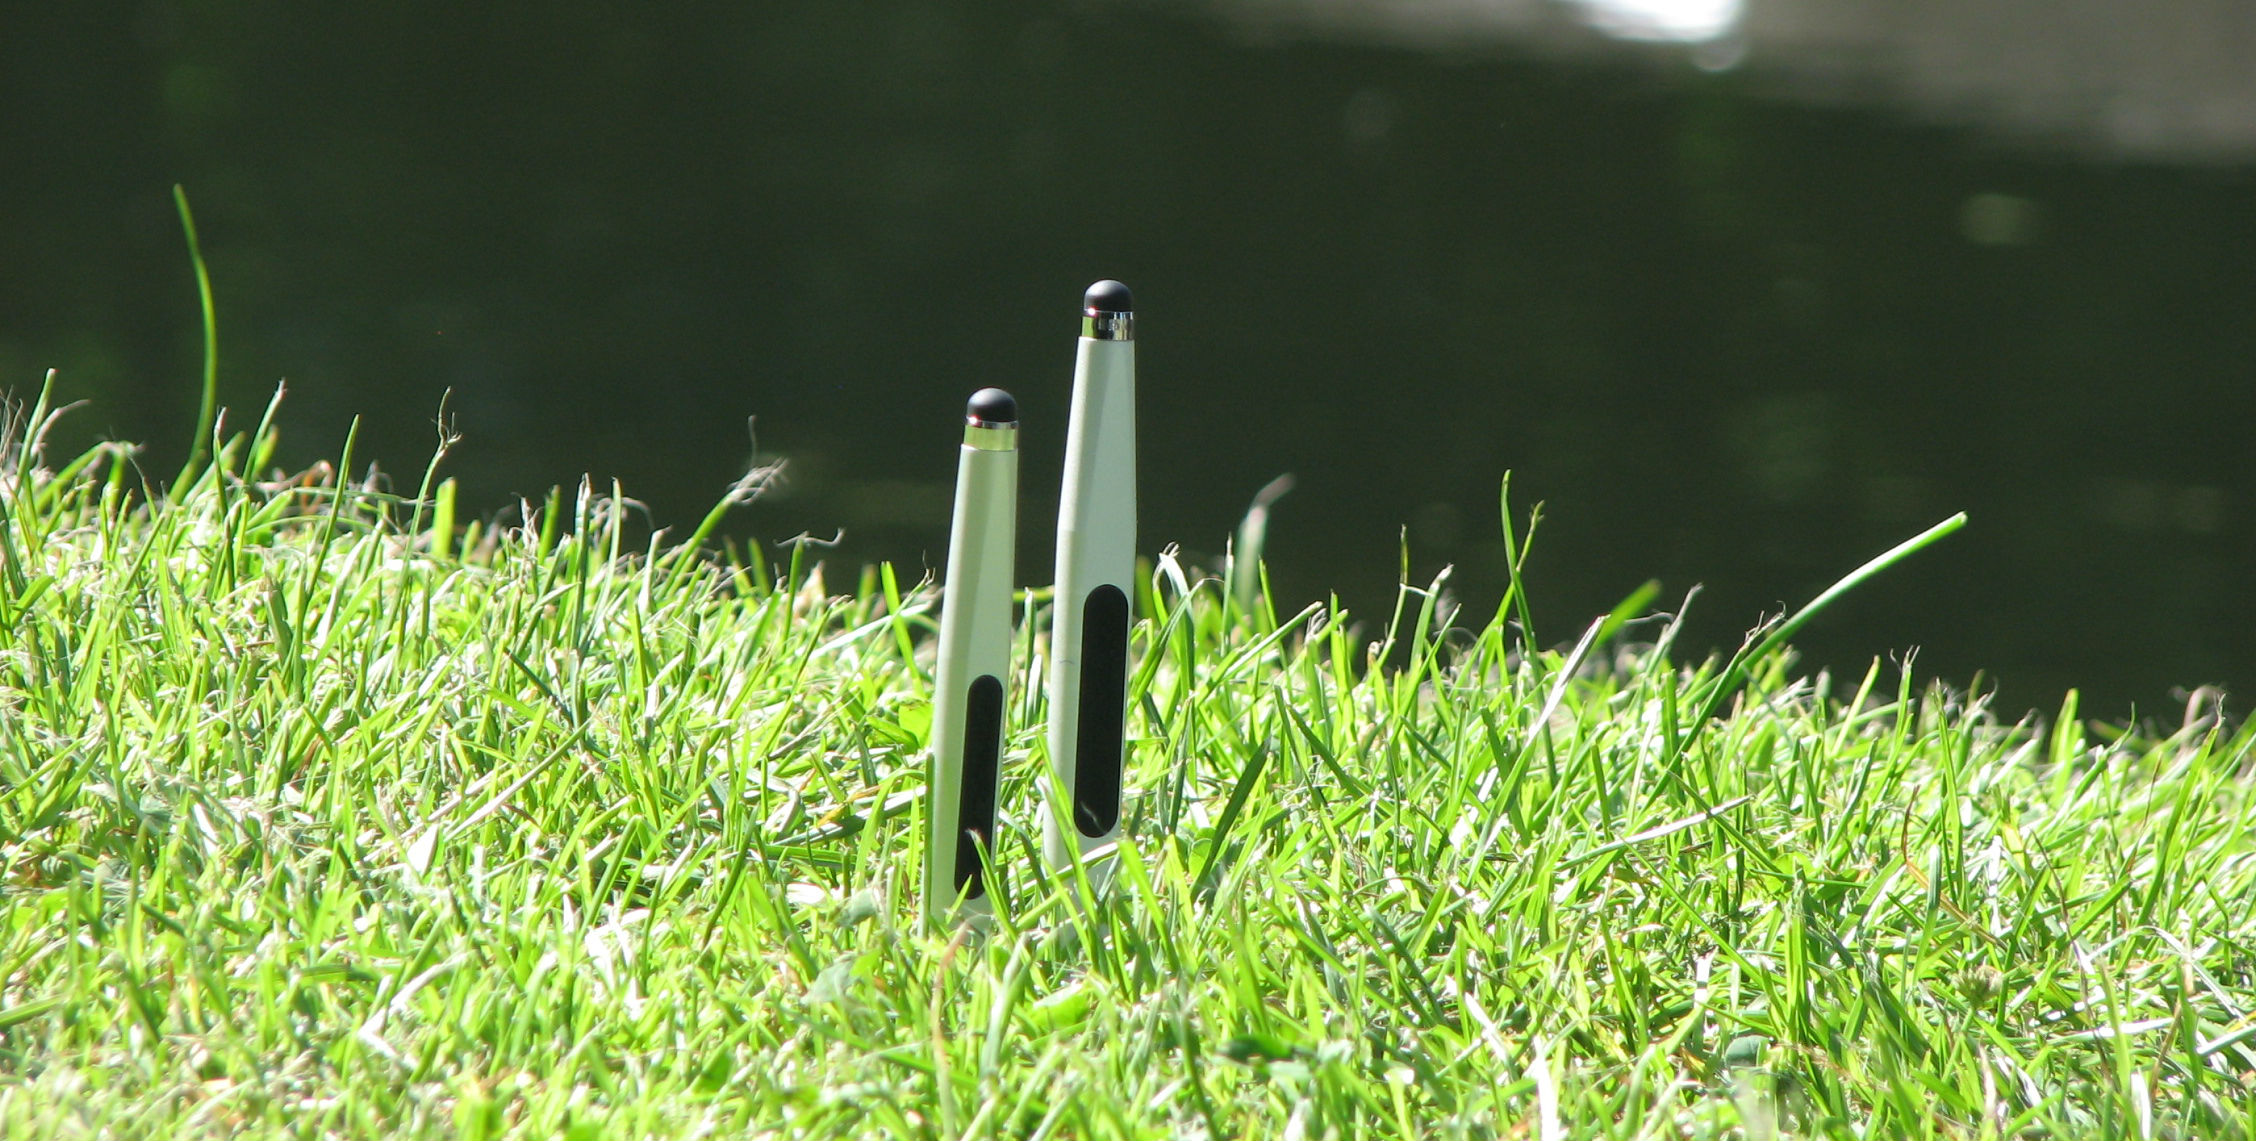 Maglus + Mini Maglus out in the park